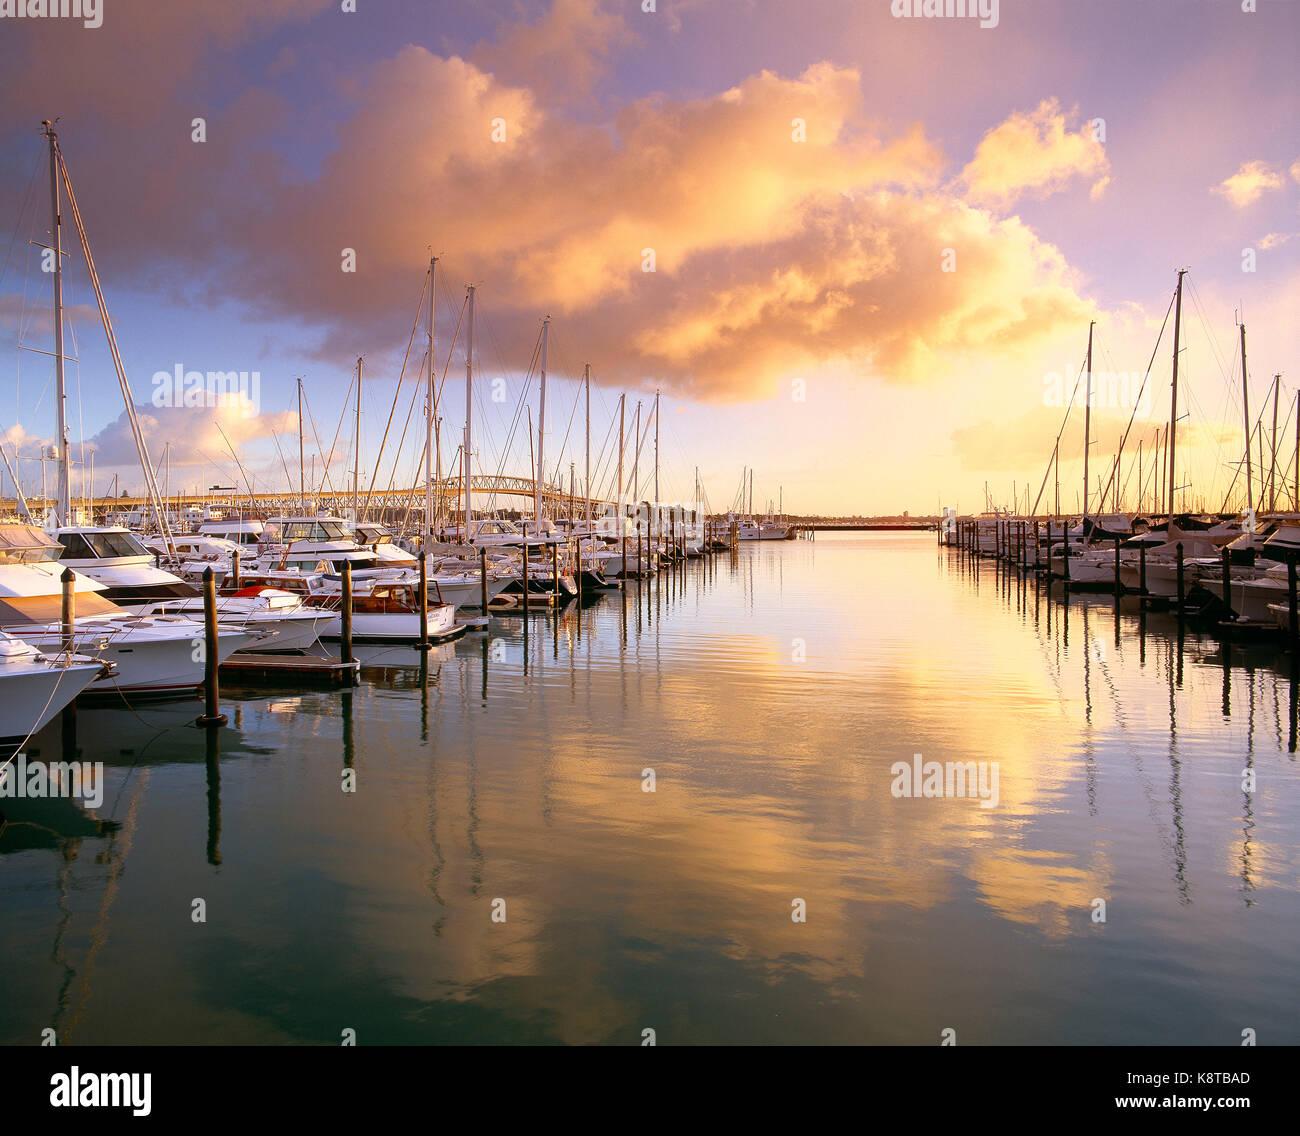 New Zealand. Auckland. Yachts in marina at sunrise. - Stock Image